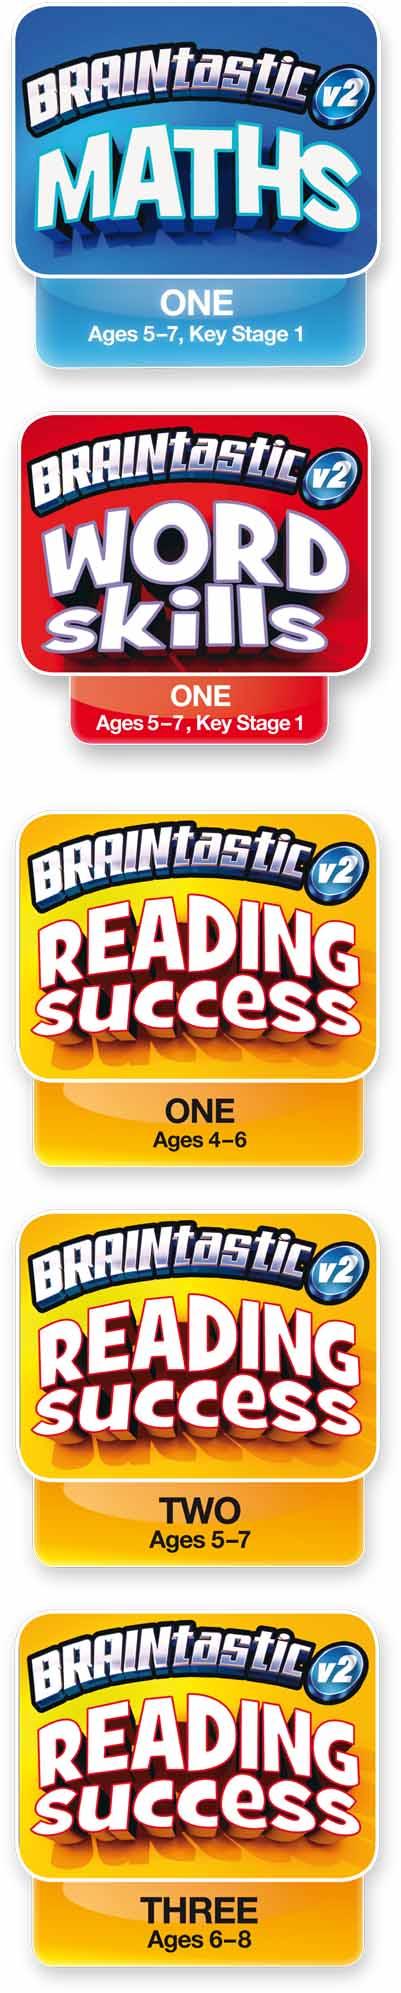 Titles included in BRAINtastic v2 Key Stage 1 Value Bundle